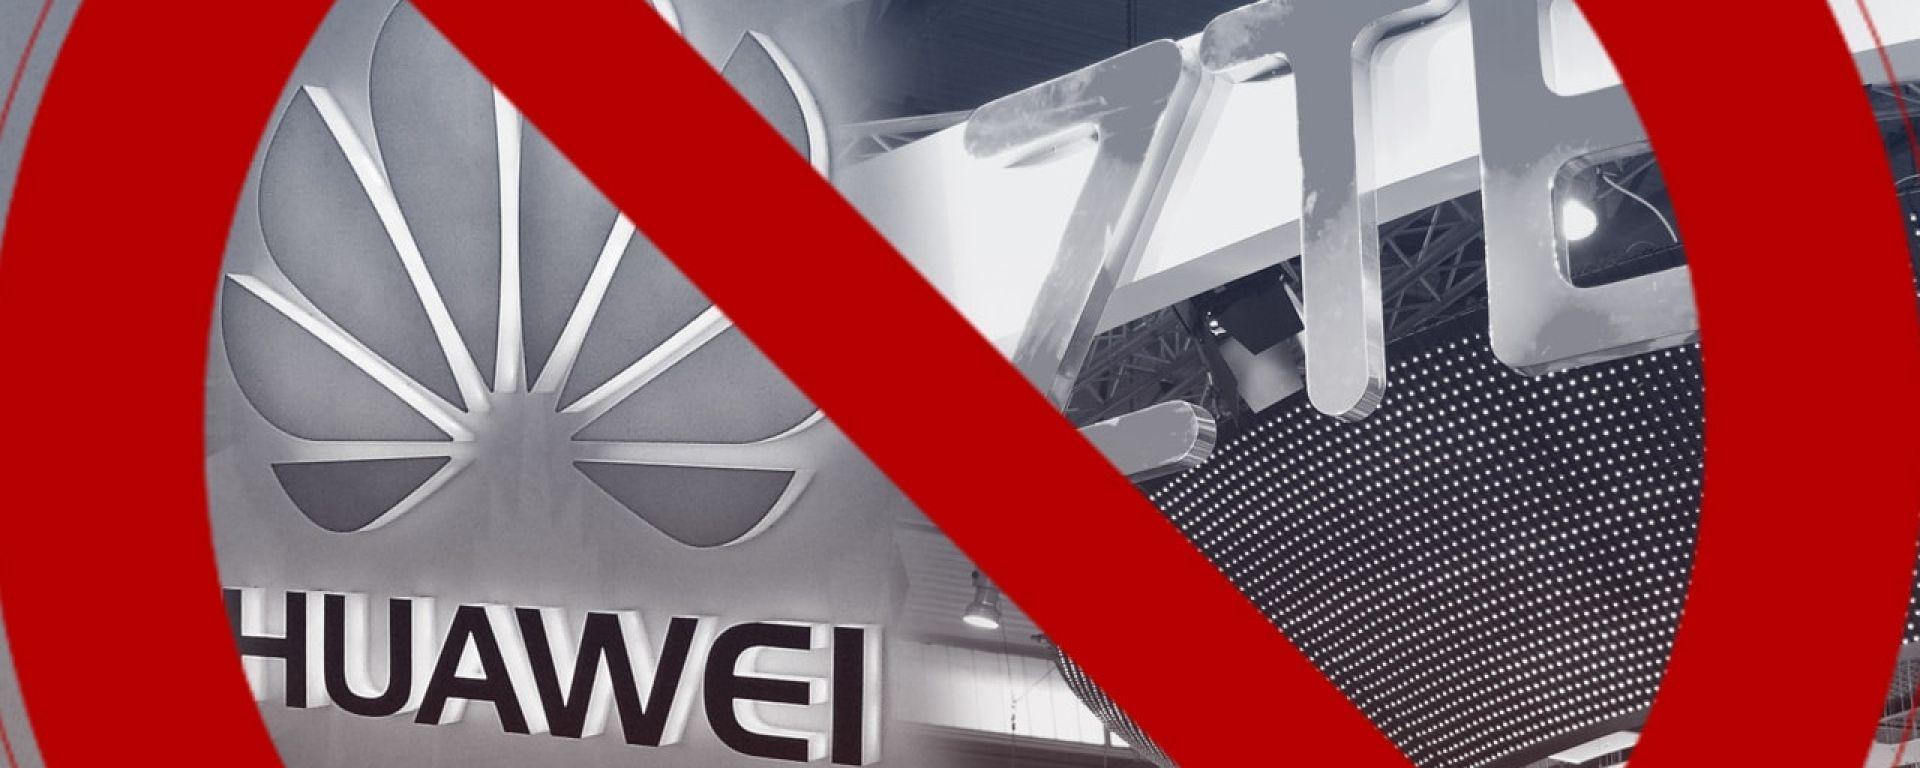 Google decapita Huawei: sospesa la licenza di Android